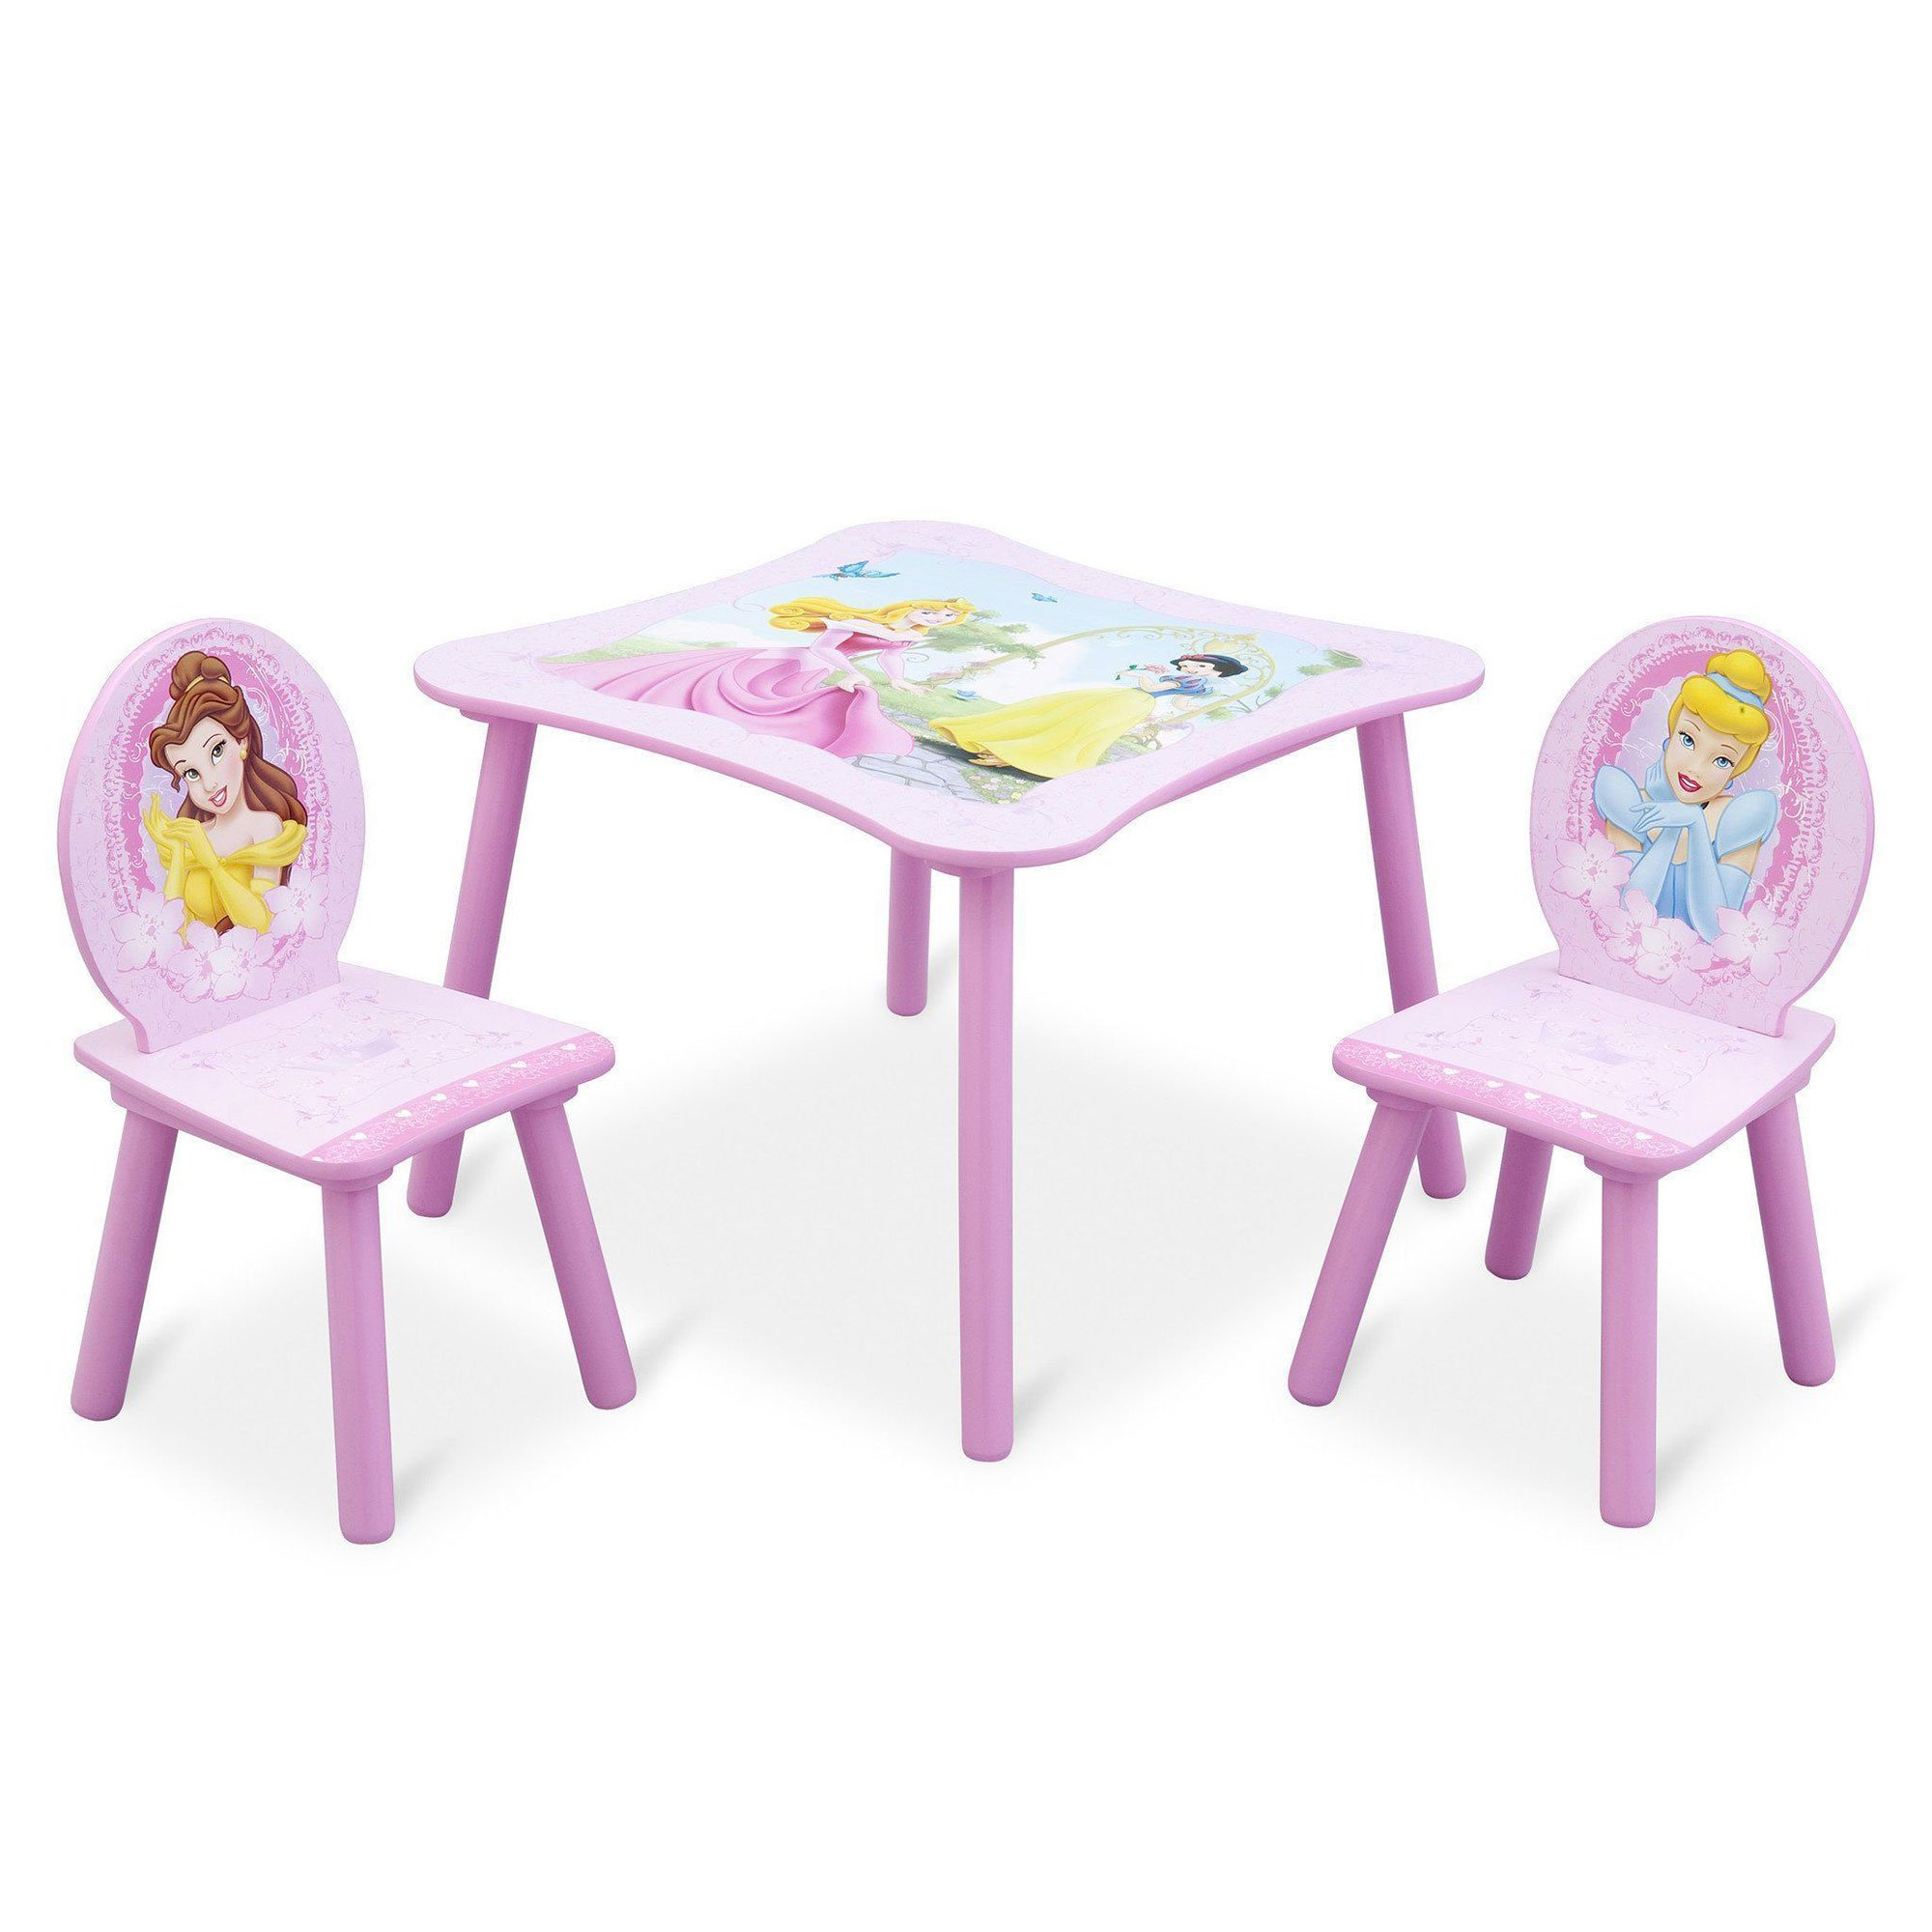 toddler table and chair set stool 3d model delta children disney princess 3 piece wood pink walmart com